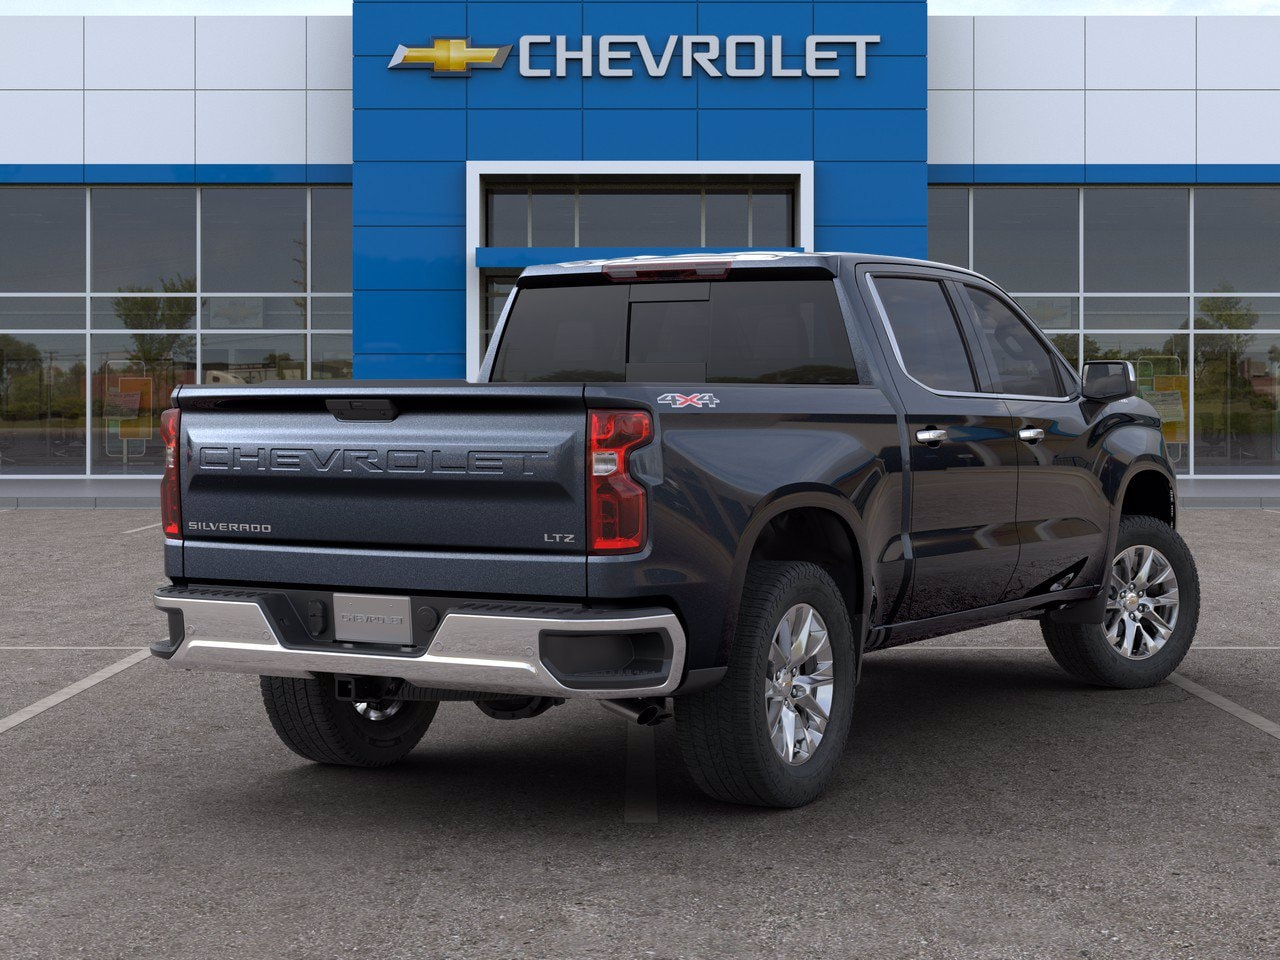 2020 Chevrolet Silverado 1500 Crew Cab 4x4, Pickup #C201490 - photo 2